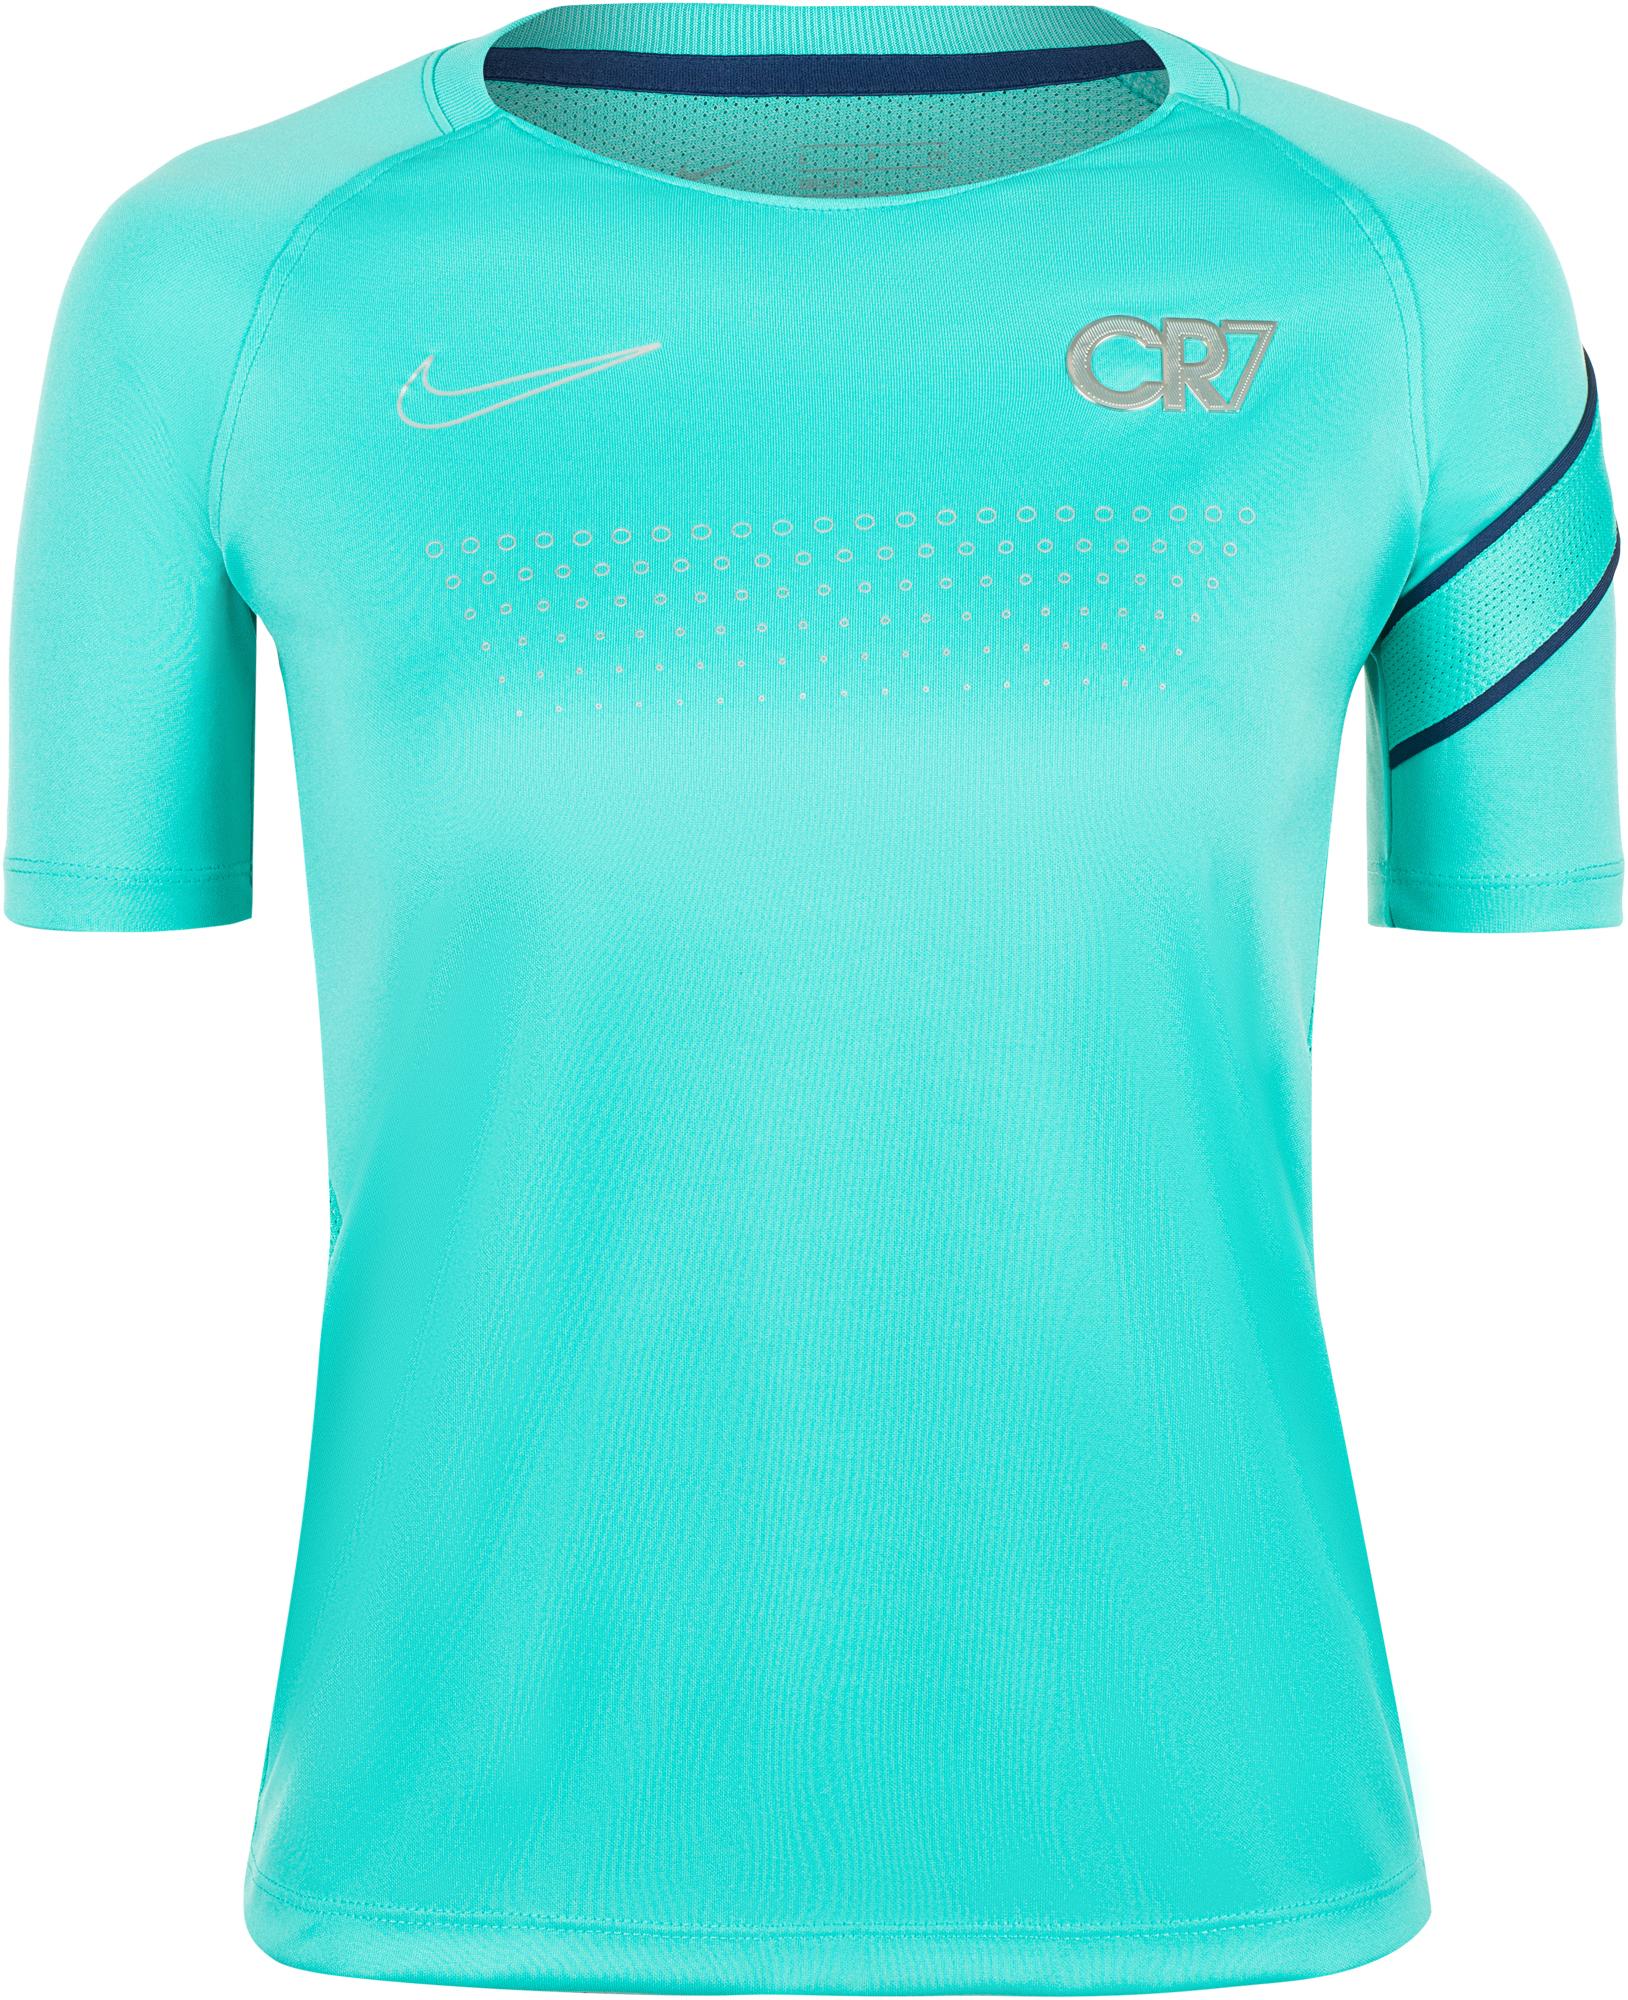 Фото - Nike Футболка для мальчиков Nike CR7 Dry, размер 128-137 nike футболка для мальчиков nike dri fit размер 128 137